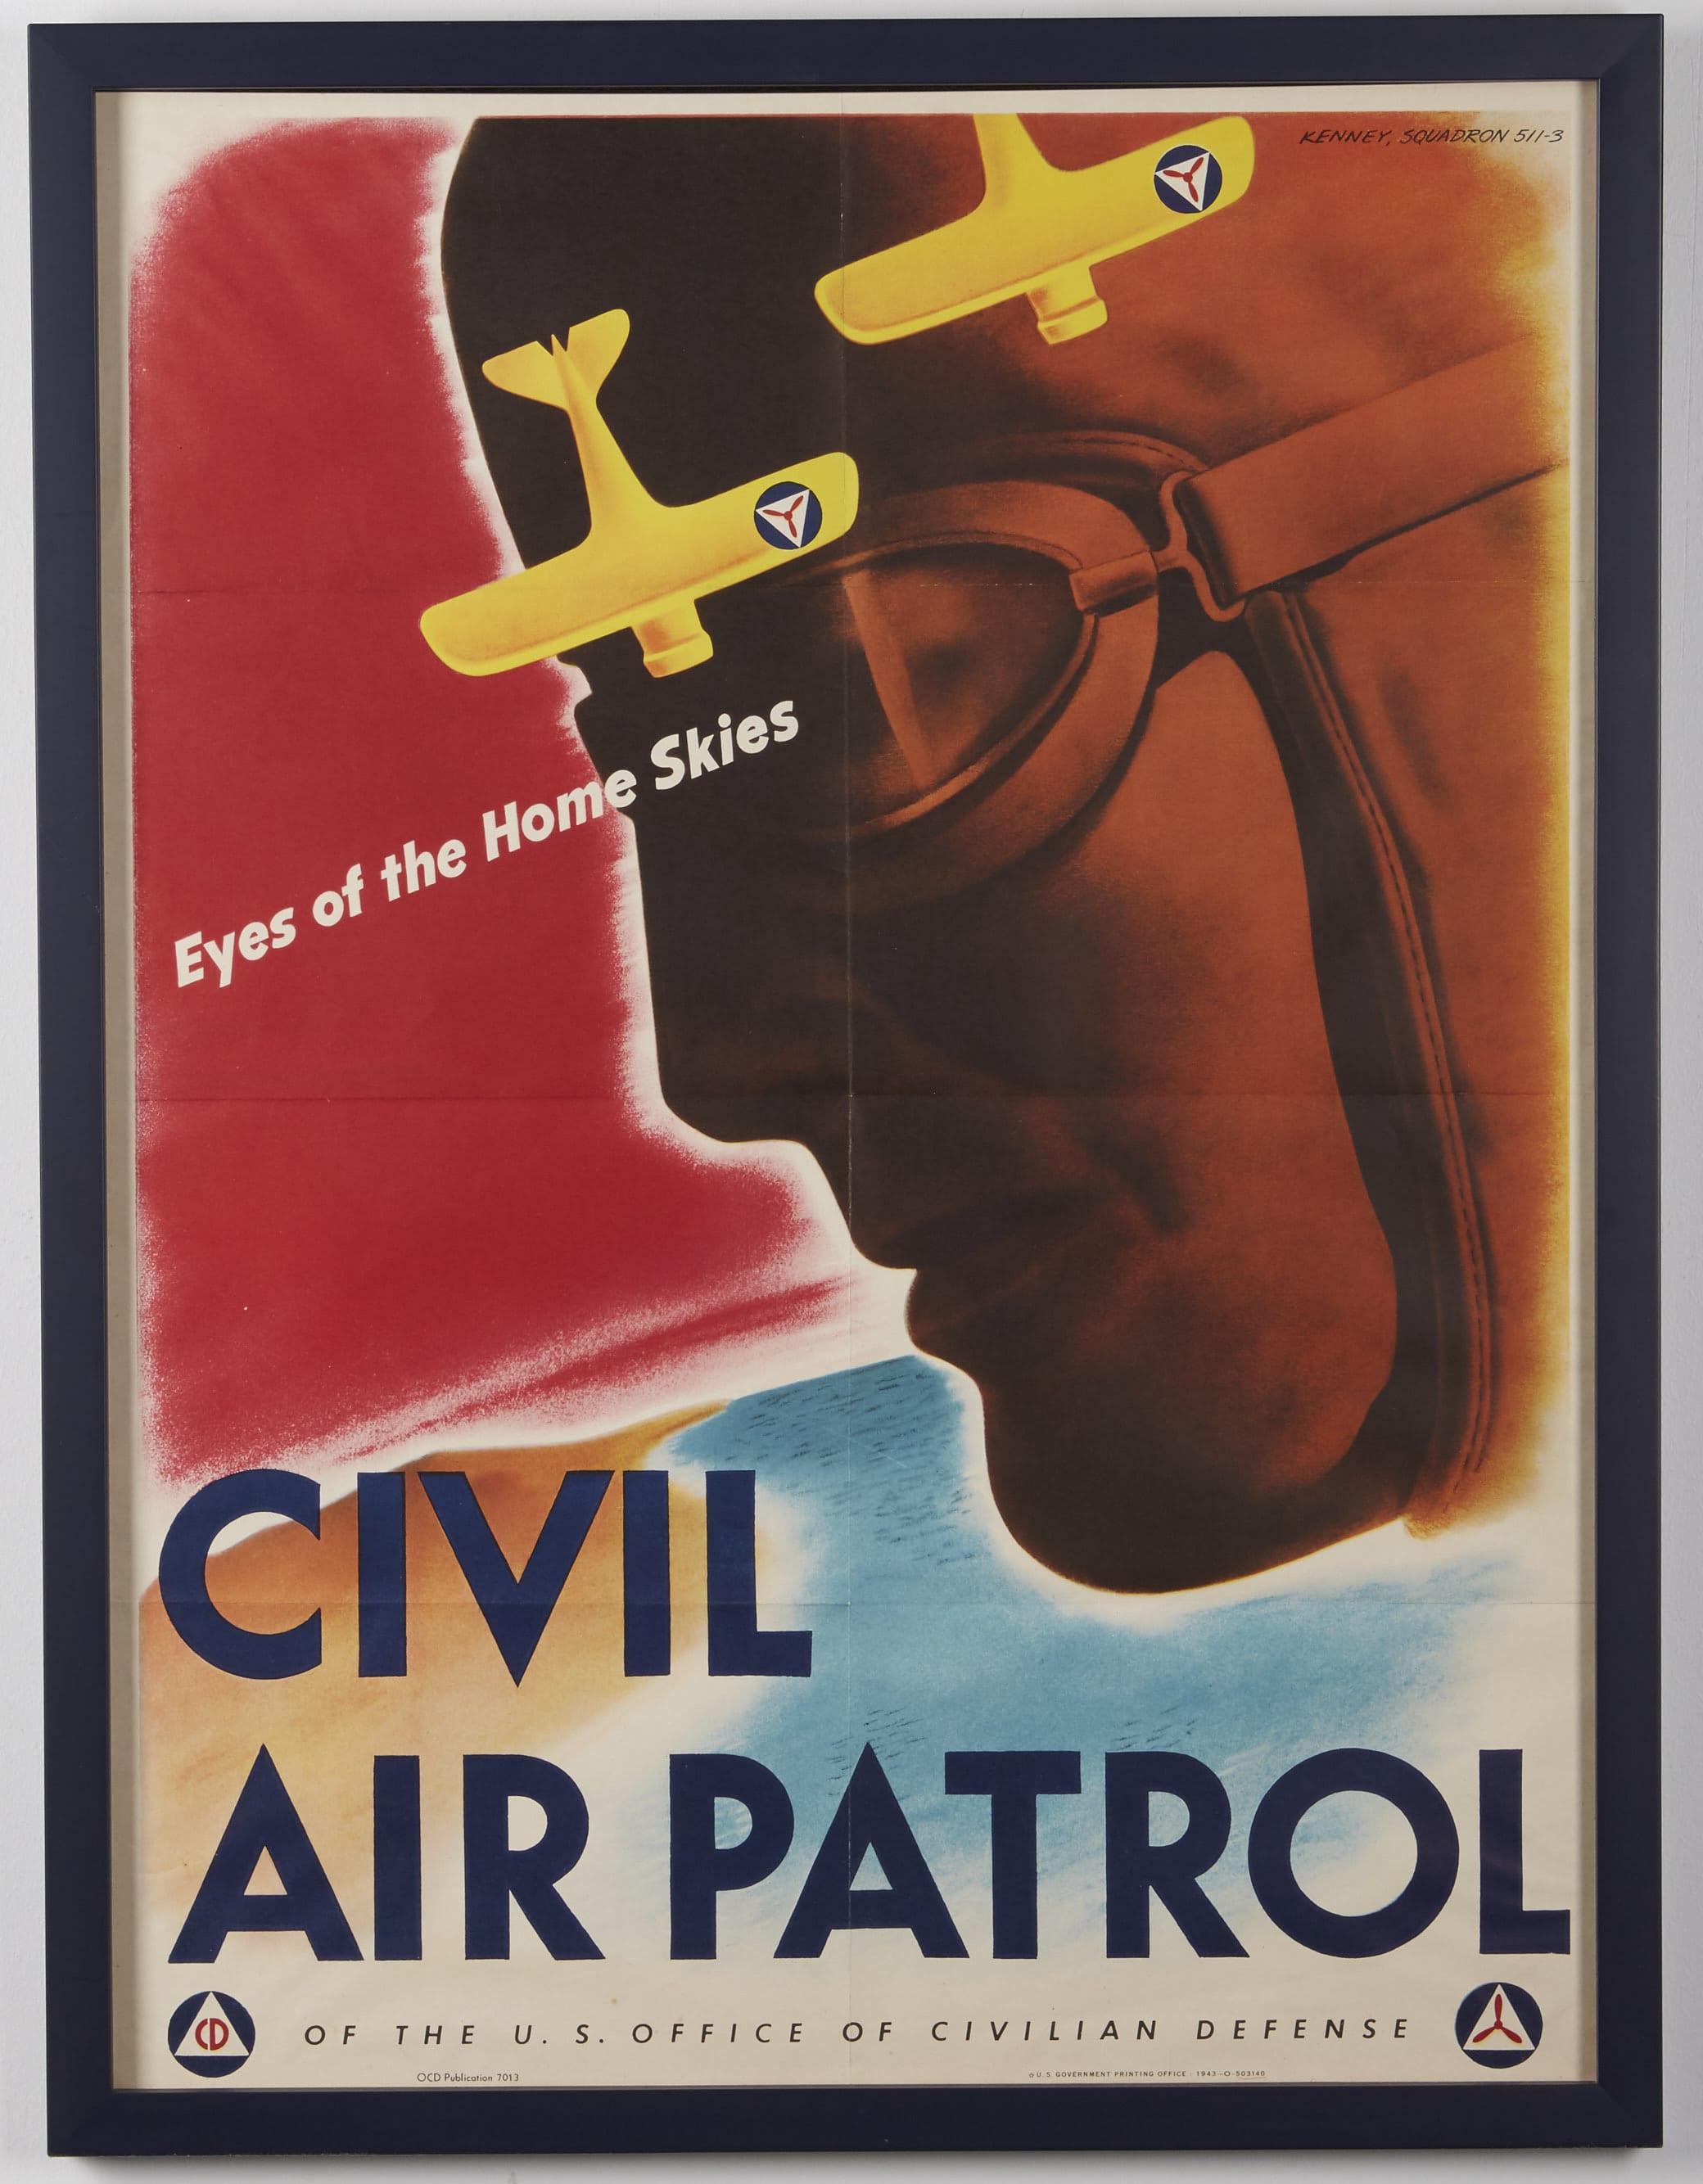 Lot 100: Eyes of the Home Skies Civil Air Patrol Poster 1943